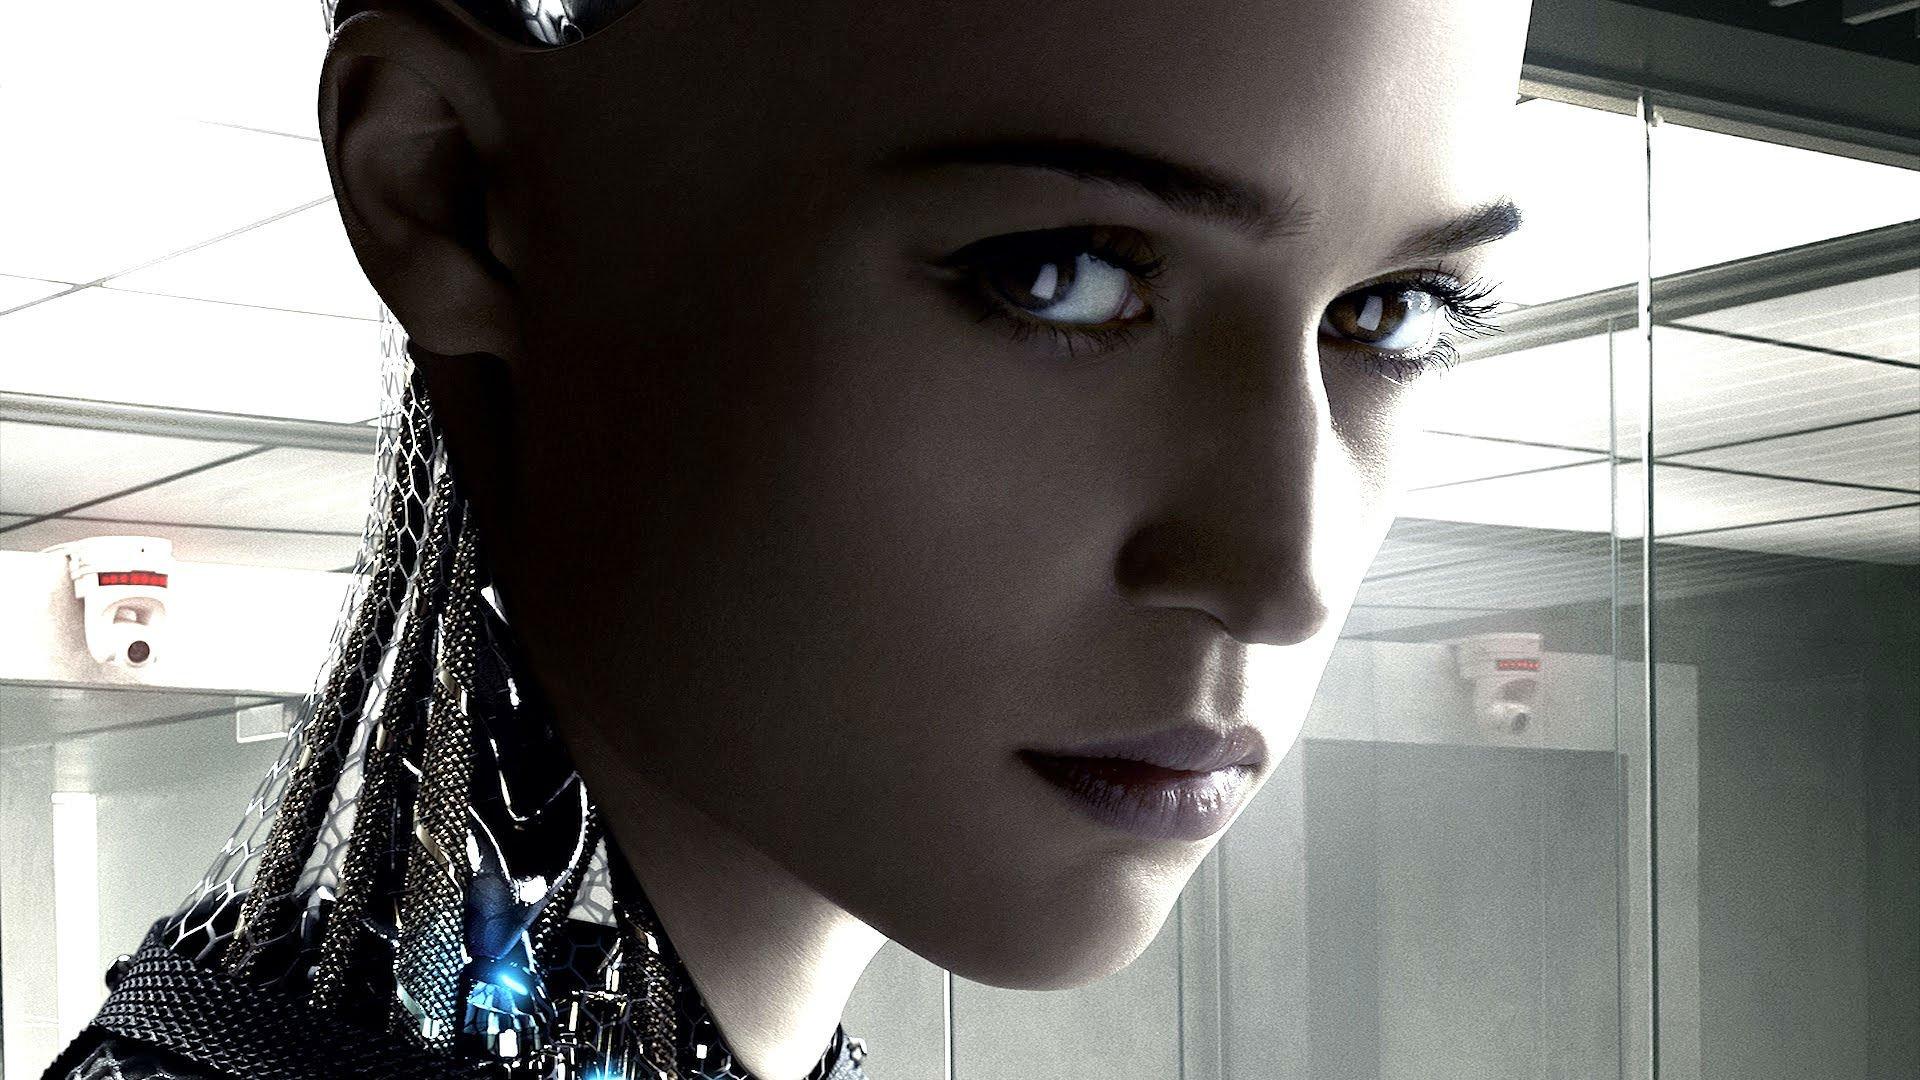 Pornbots are invading PSN screenshot